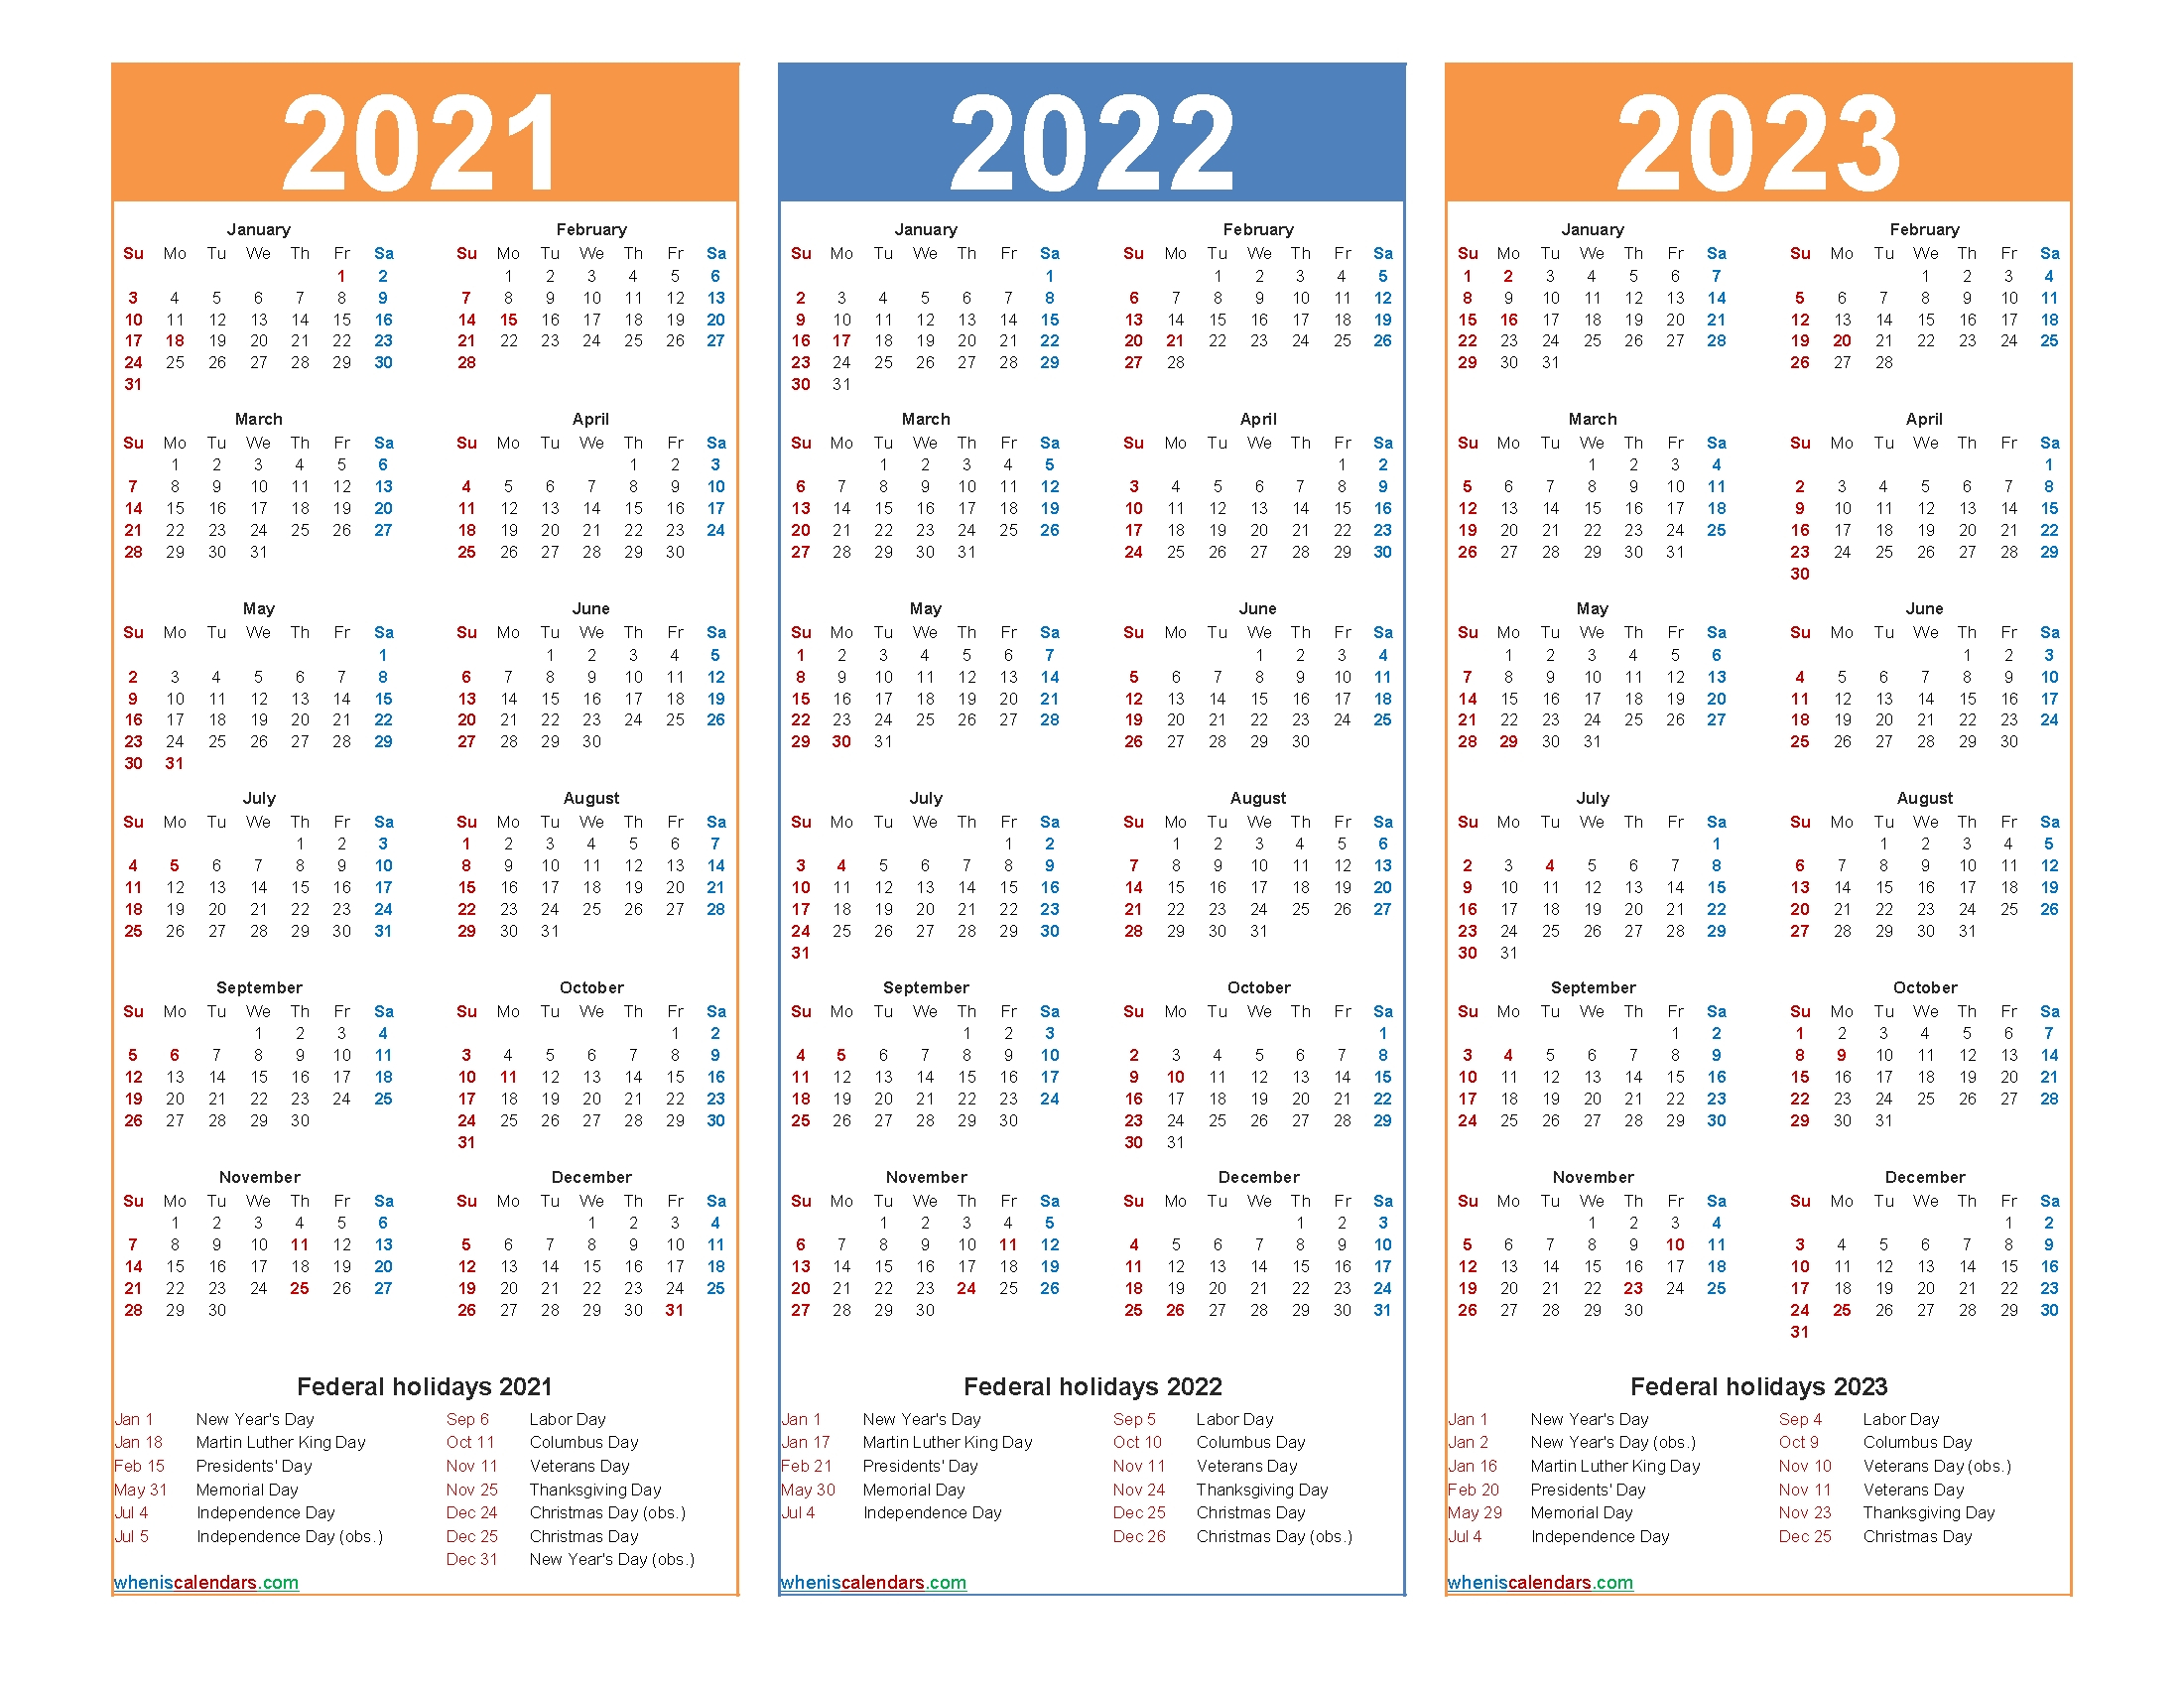 3 Year Calendars 2021 2022 2023 Free Printable   Calendar for 2022 2023 School Calendar North Penn